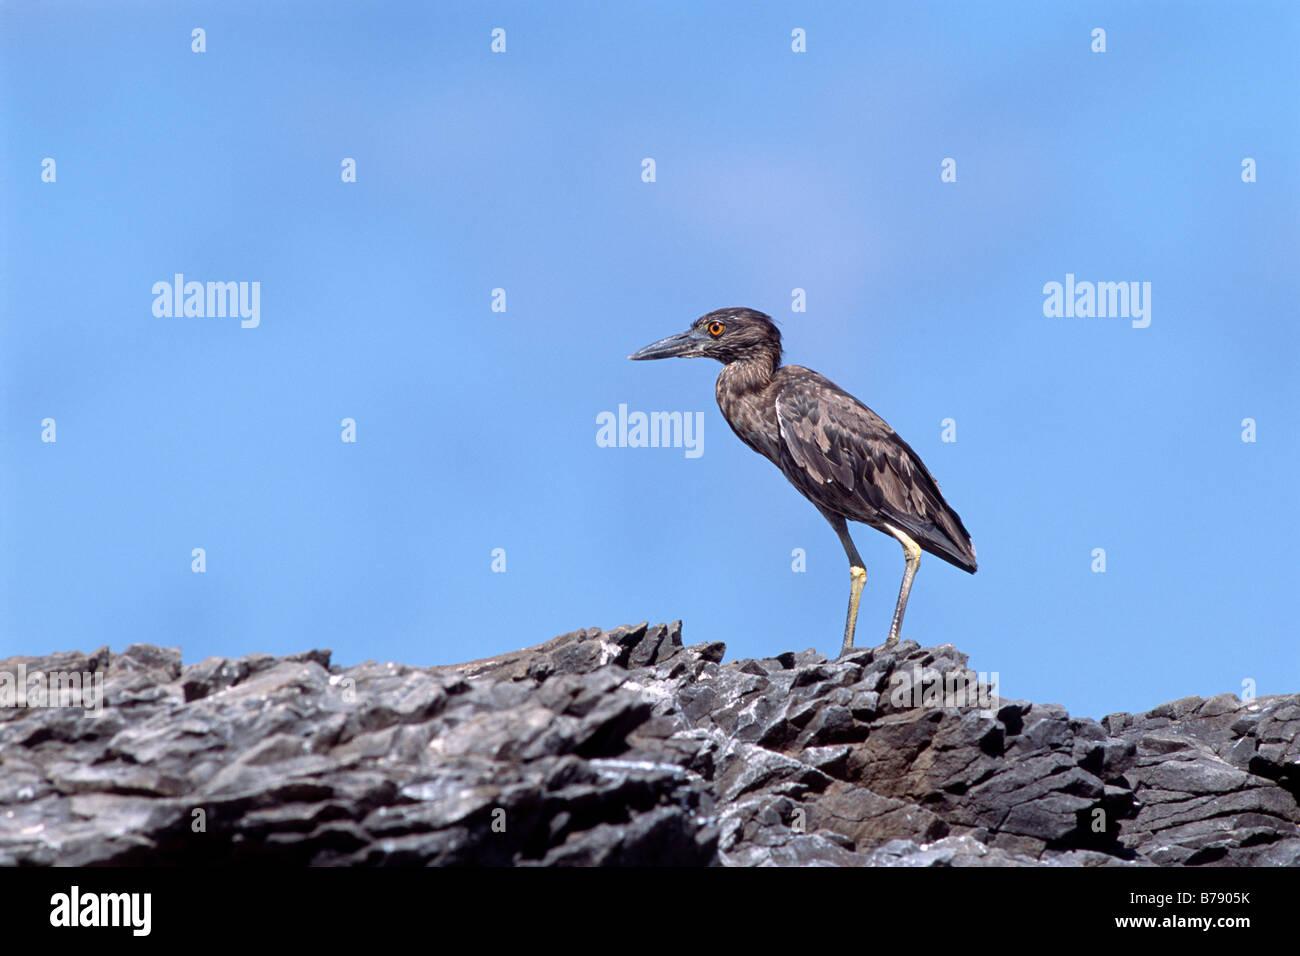 Lava Heron (Butorides sundevalli), Insel Fernandina, Galapagos Inseln, Galapagos Islands, Ecuador, South America - Stock Image